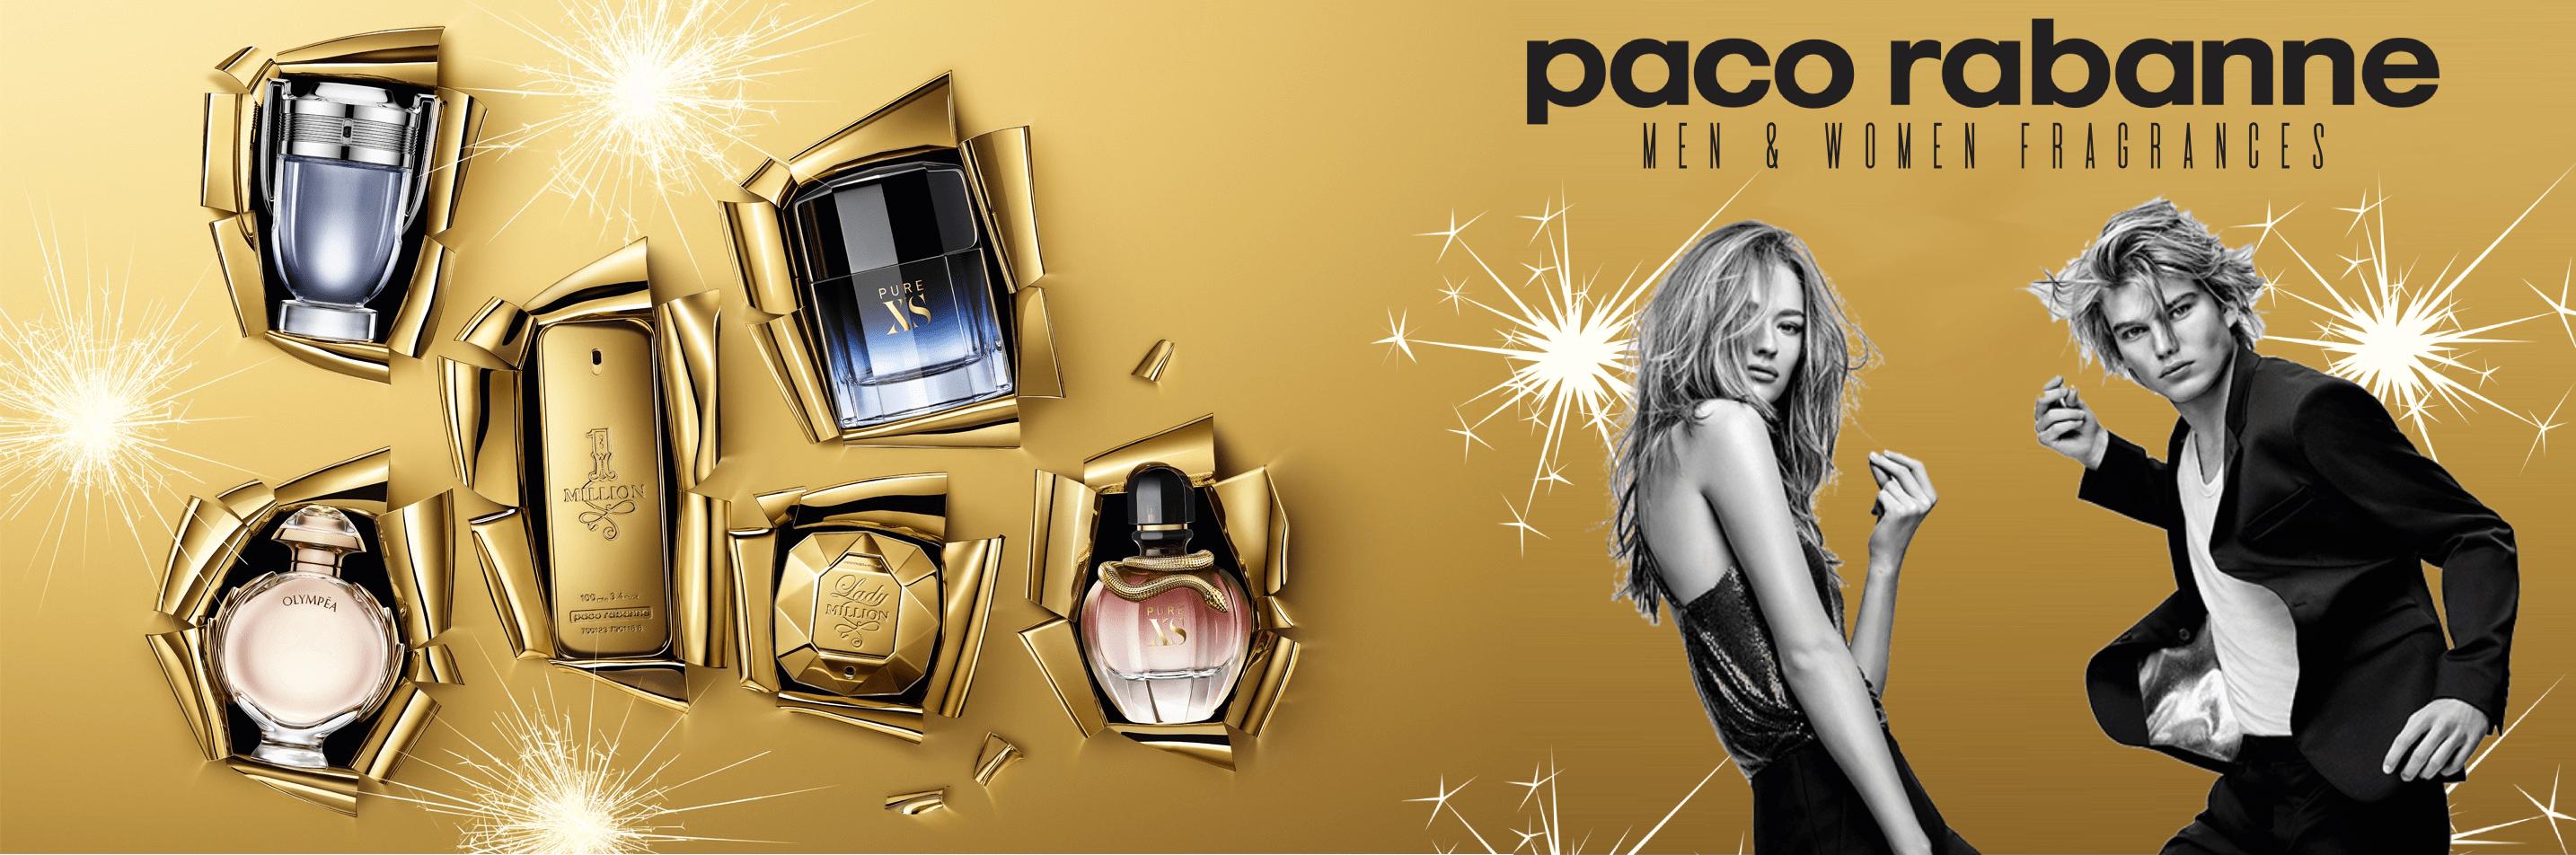 paco rabanne original store in Egypt|||||fragrance wheel|intensity of perfumes